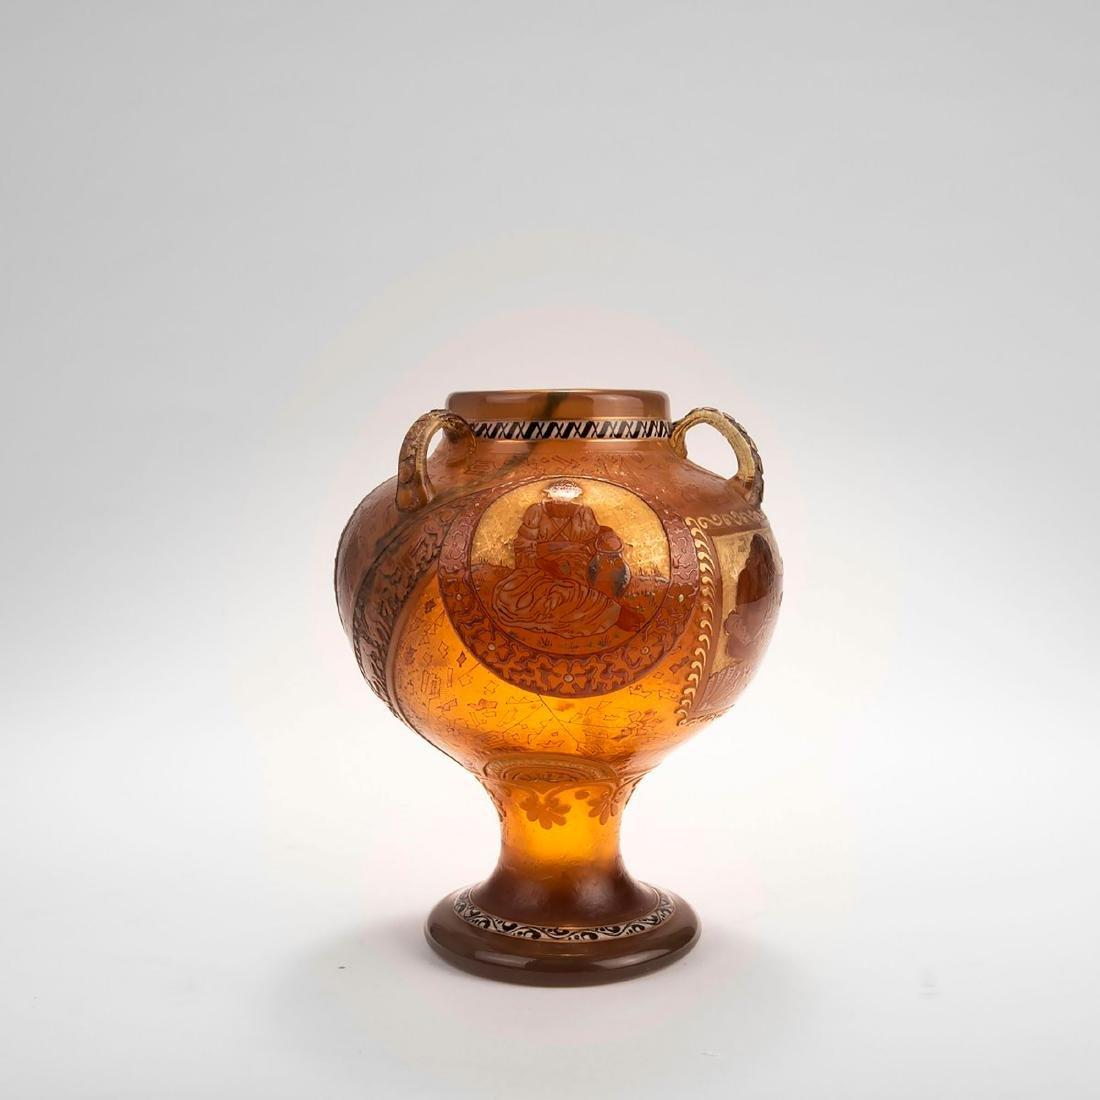 'Echoes of Hellas' vase with handles, 1895-1900 - 4